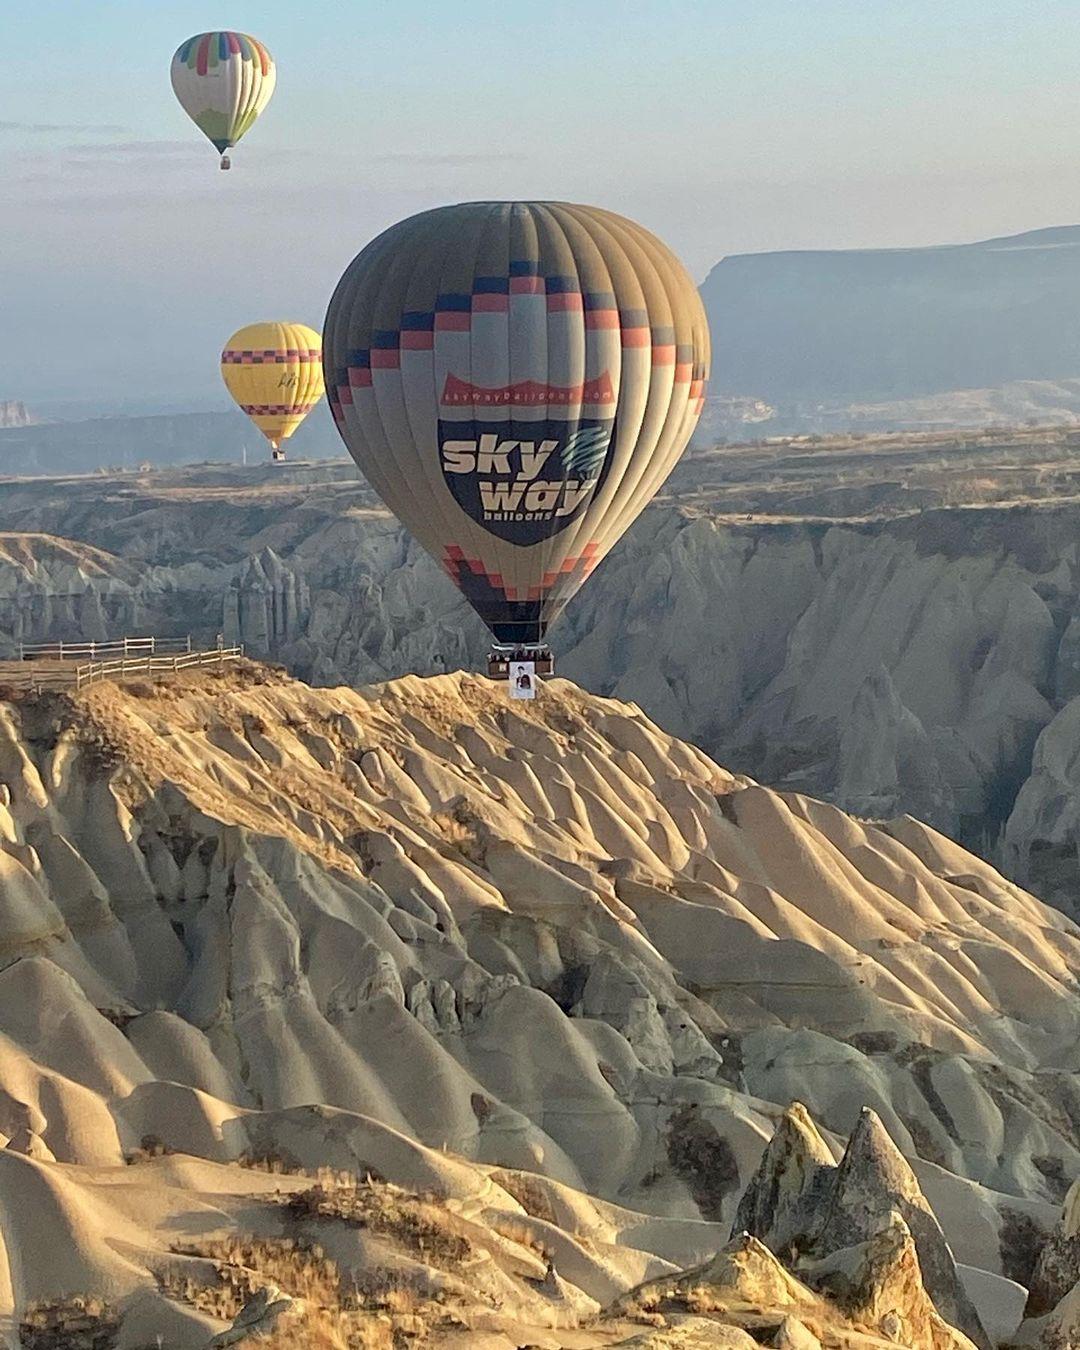 Skyway Balloons